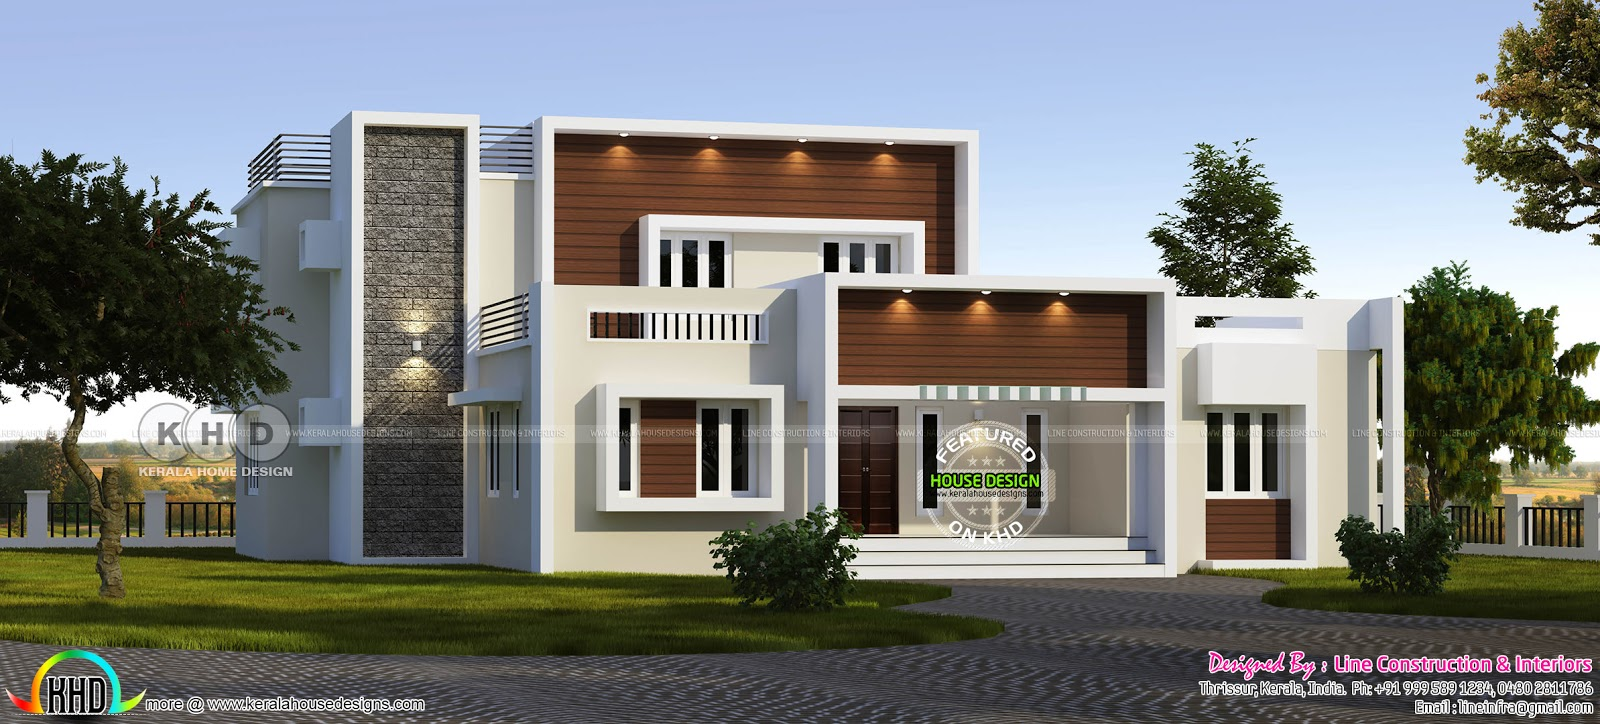 5 bedroom contemporary residence design kerala home for Modern residences